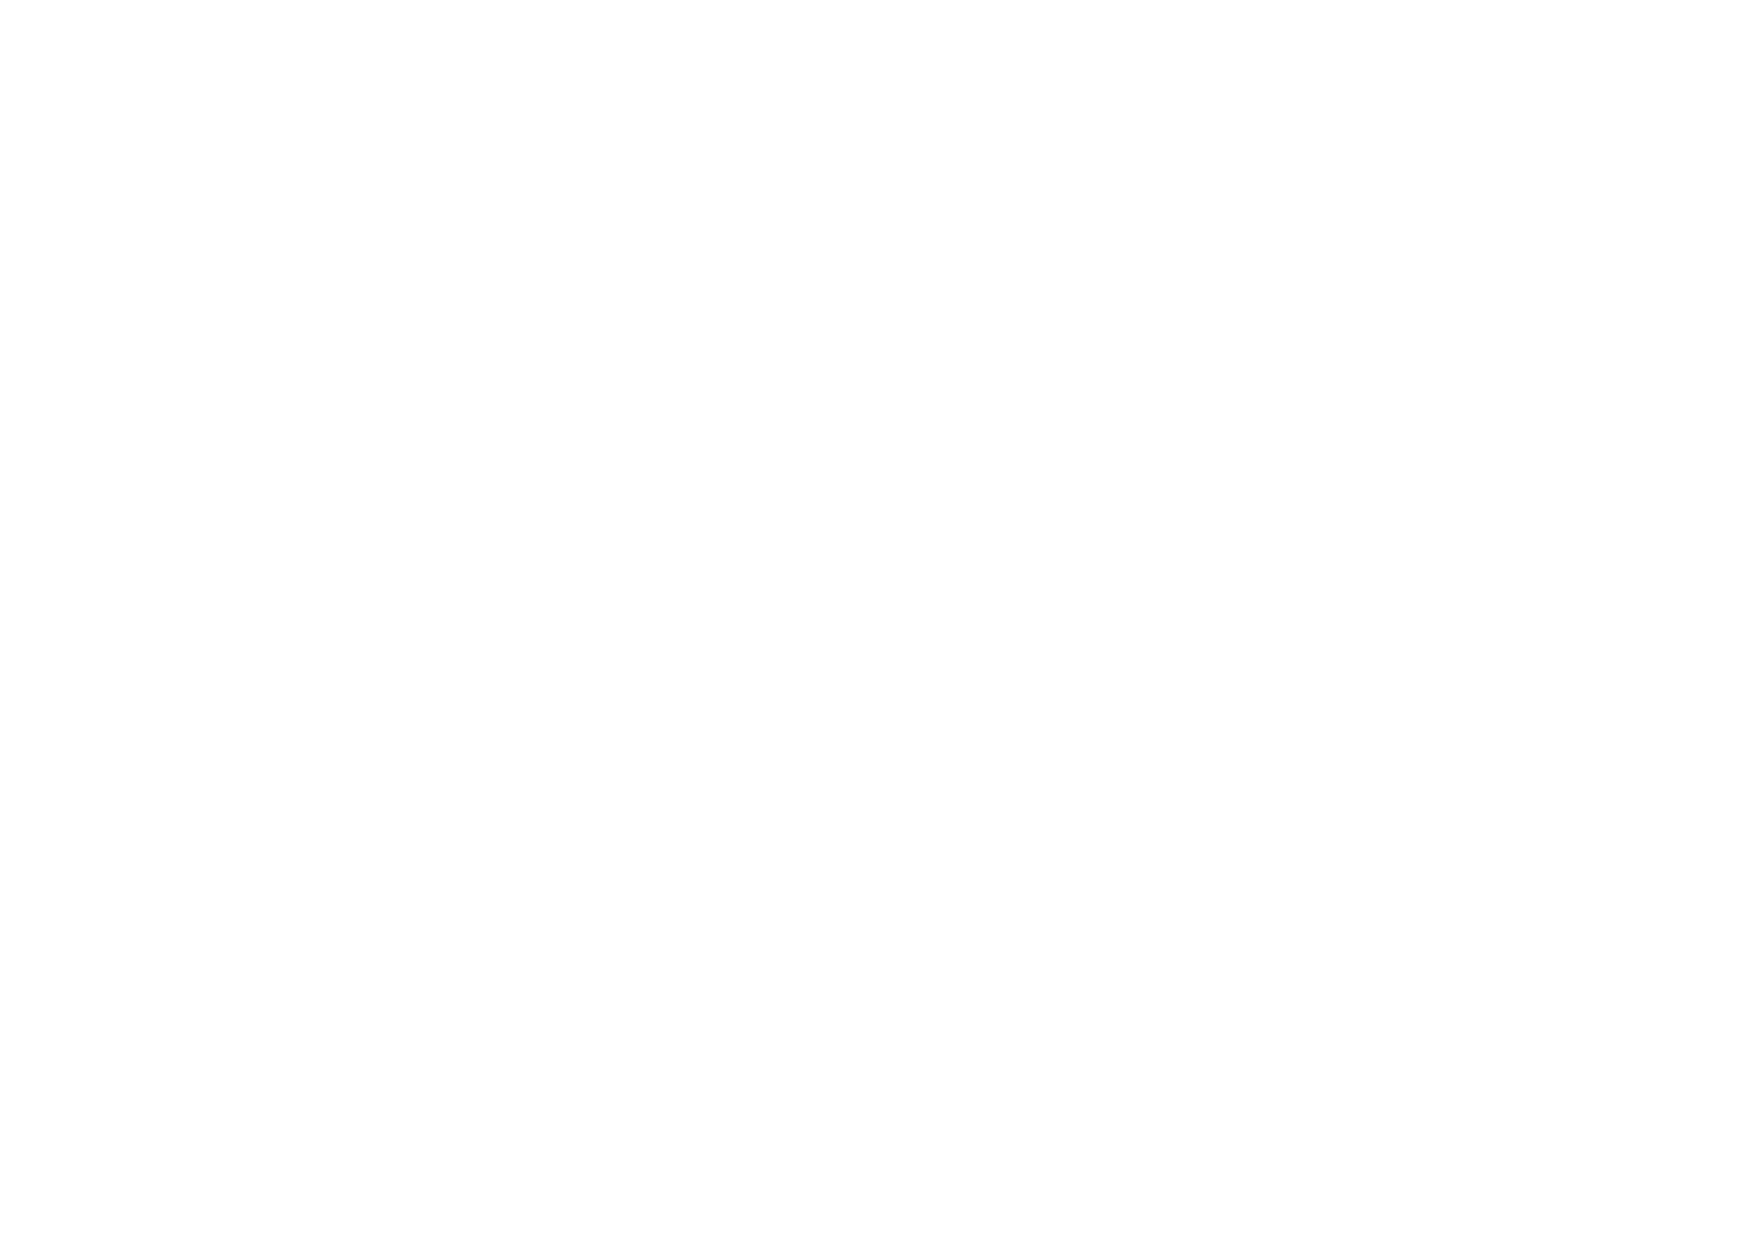 Horizon immobilier, agence immobilière